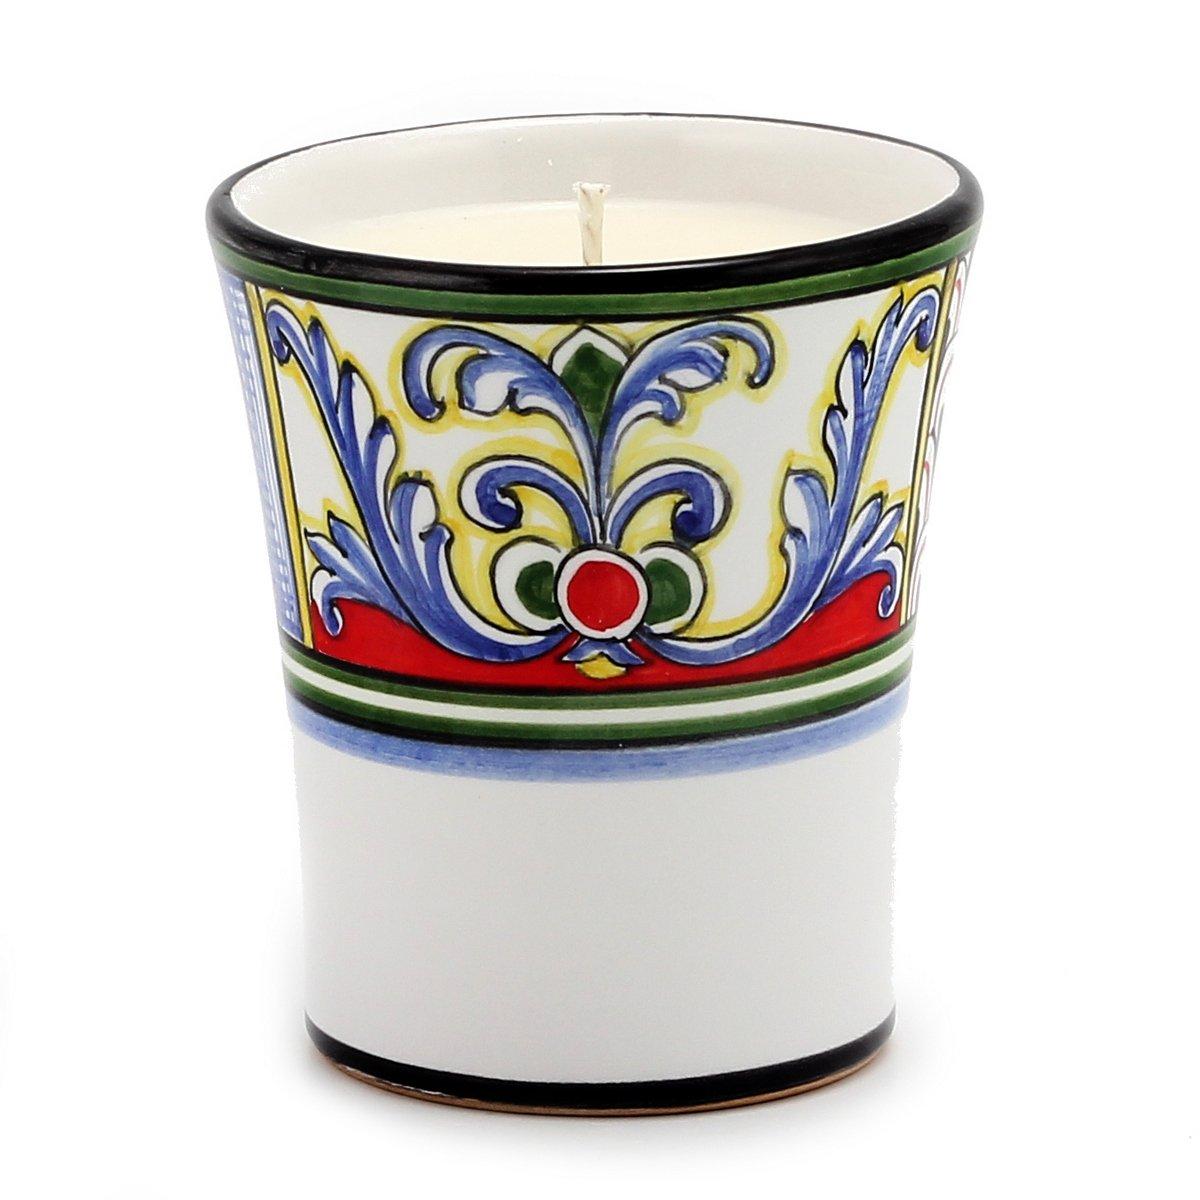 DERUTA CANDLE: Contempo Cup YASMINE Design, Tuscan Apple Harvest